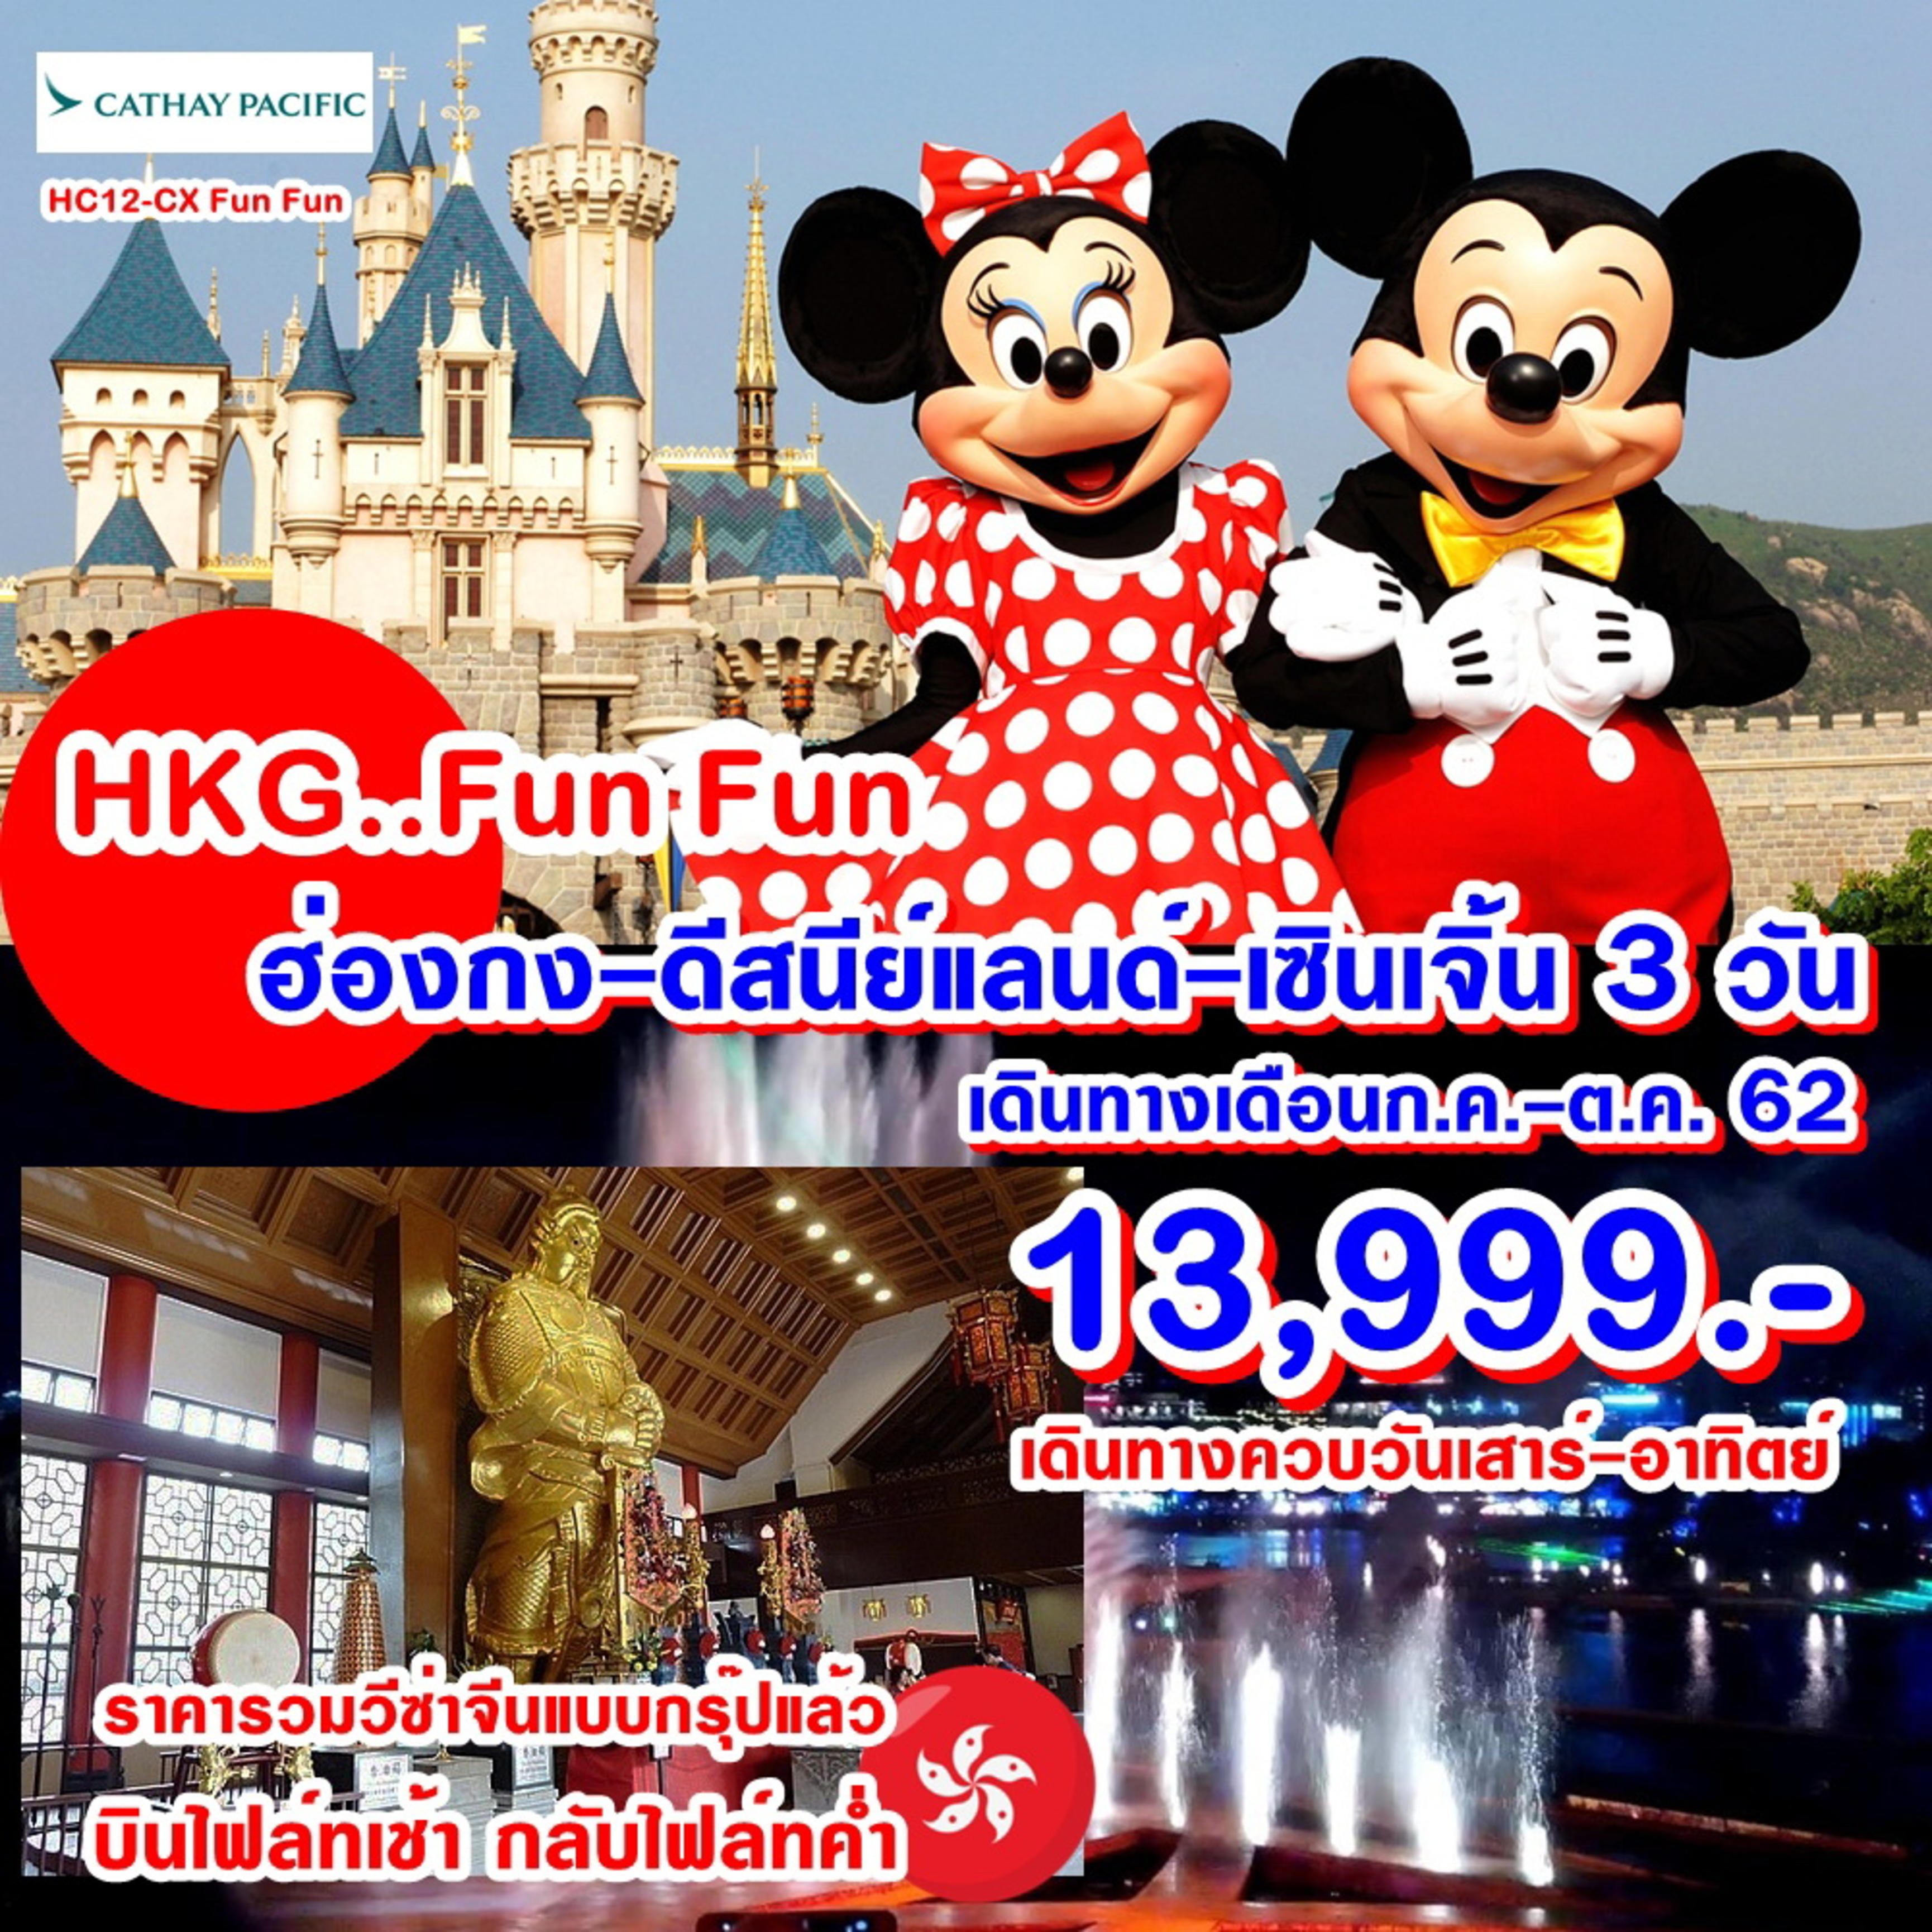 HC12-CX Fun Fun Hkg-Disneyland-Szx 3 Days